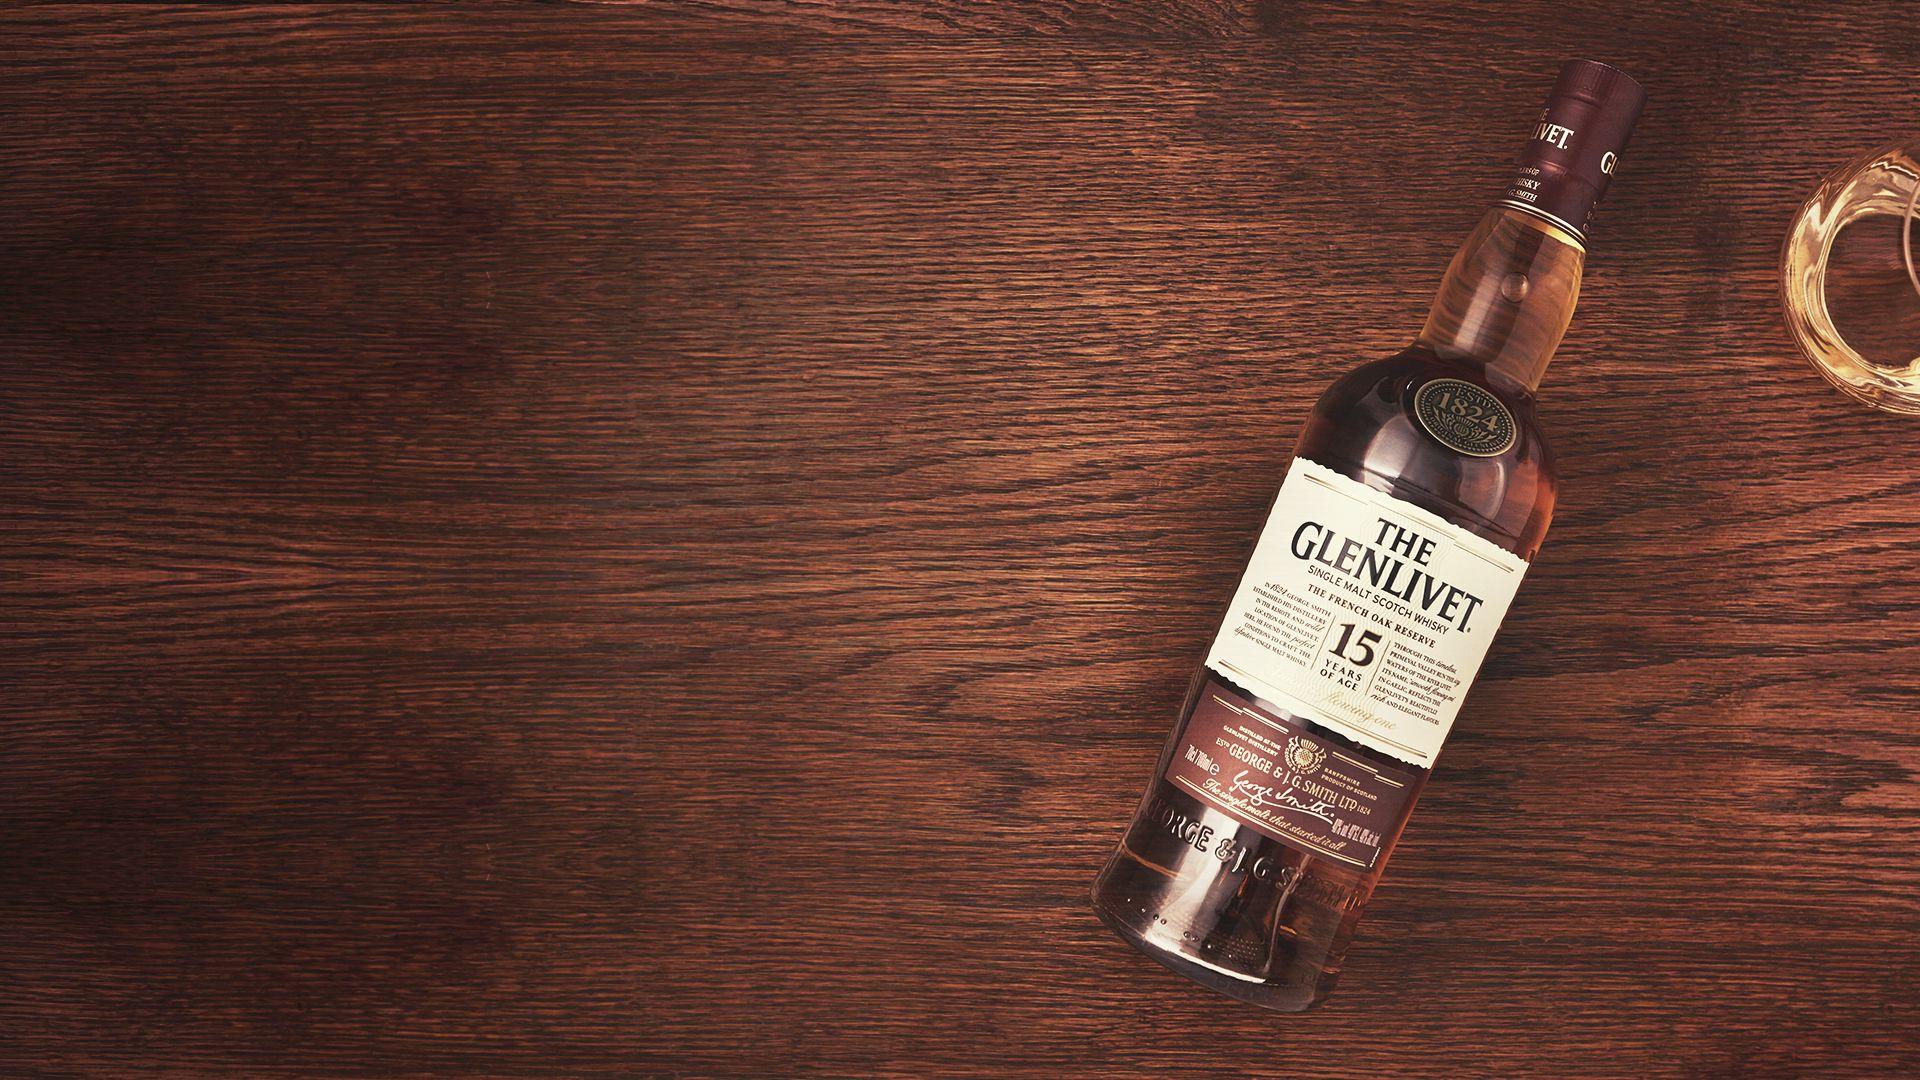 The Glenlivet 15 year old Single Malt Whisky 70cl £33 @ Amazon